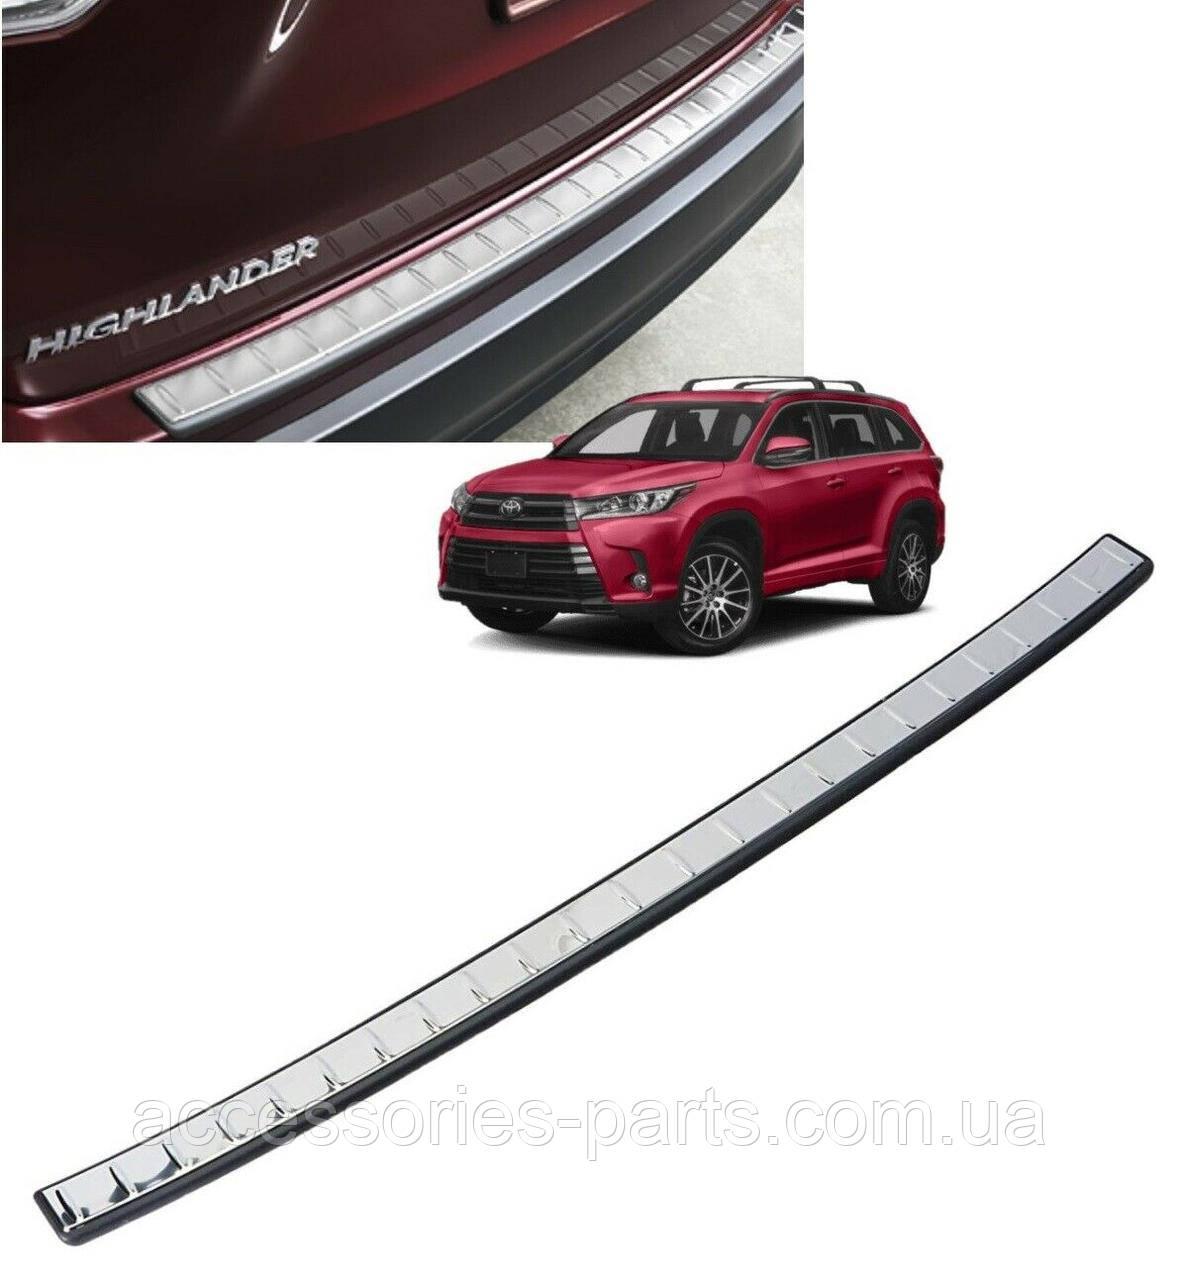 Накладка заднего бампера 2014-2018 Toyota Highlander Hybrid Новая Оригинальная